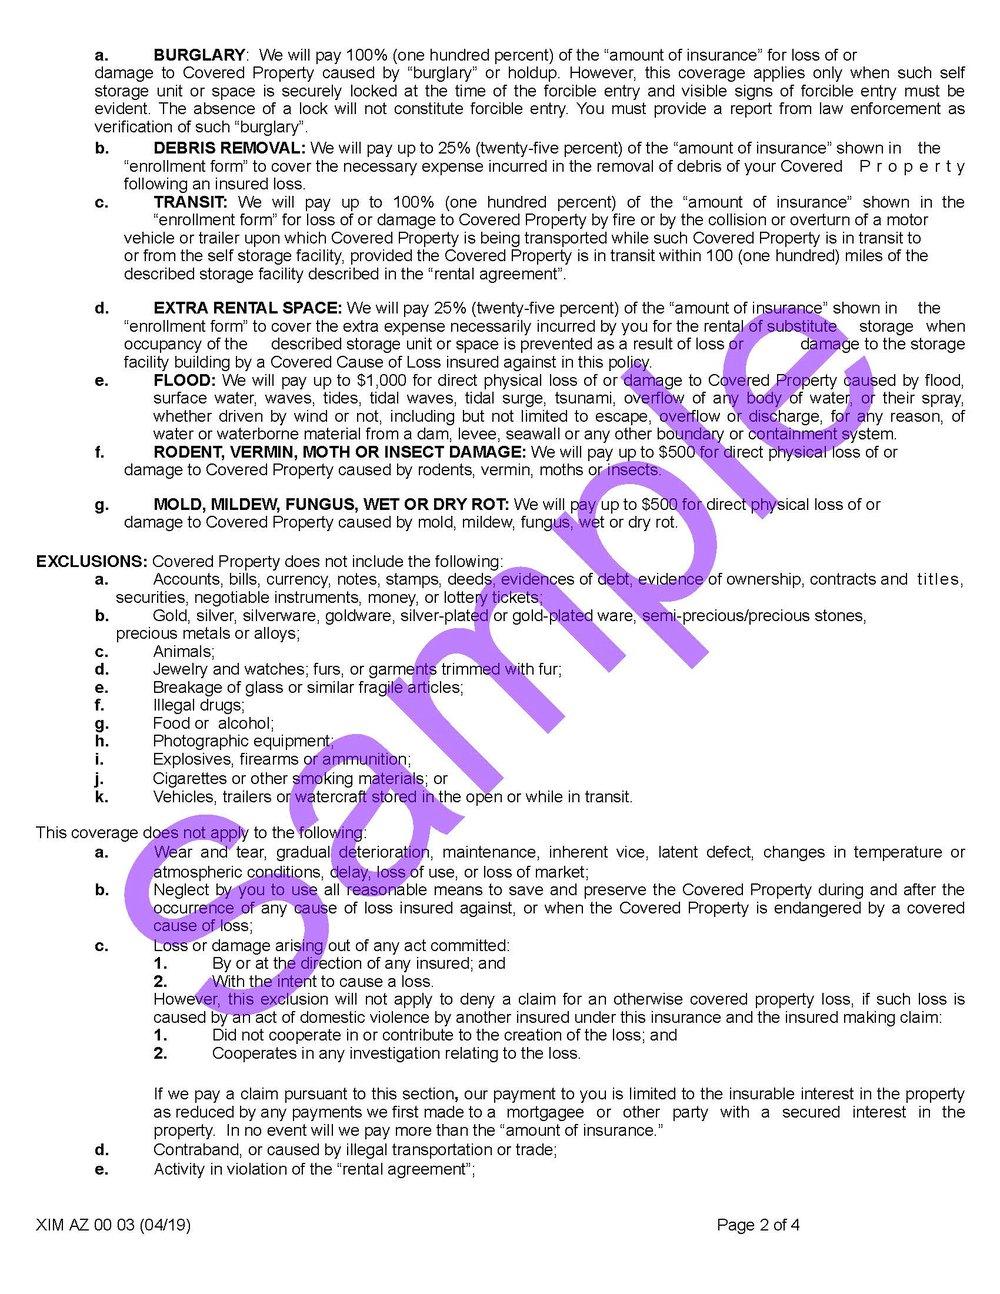 XIM AZ 00 03 04 19 Arizona Certificate of Insurance_Page_2.jpg